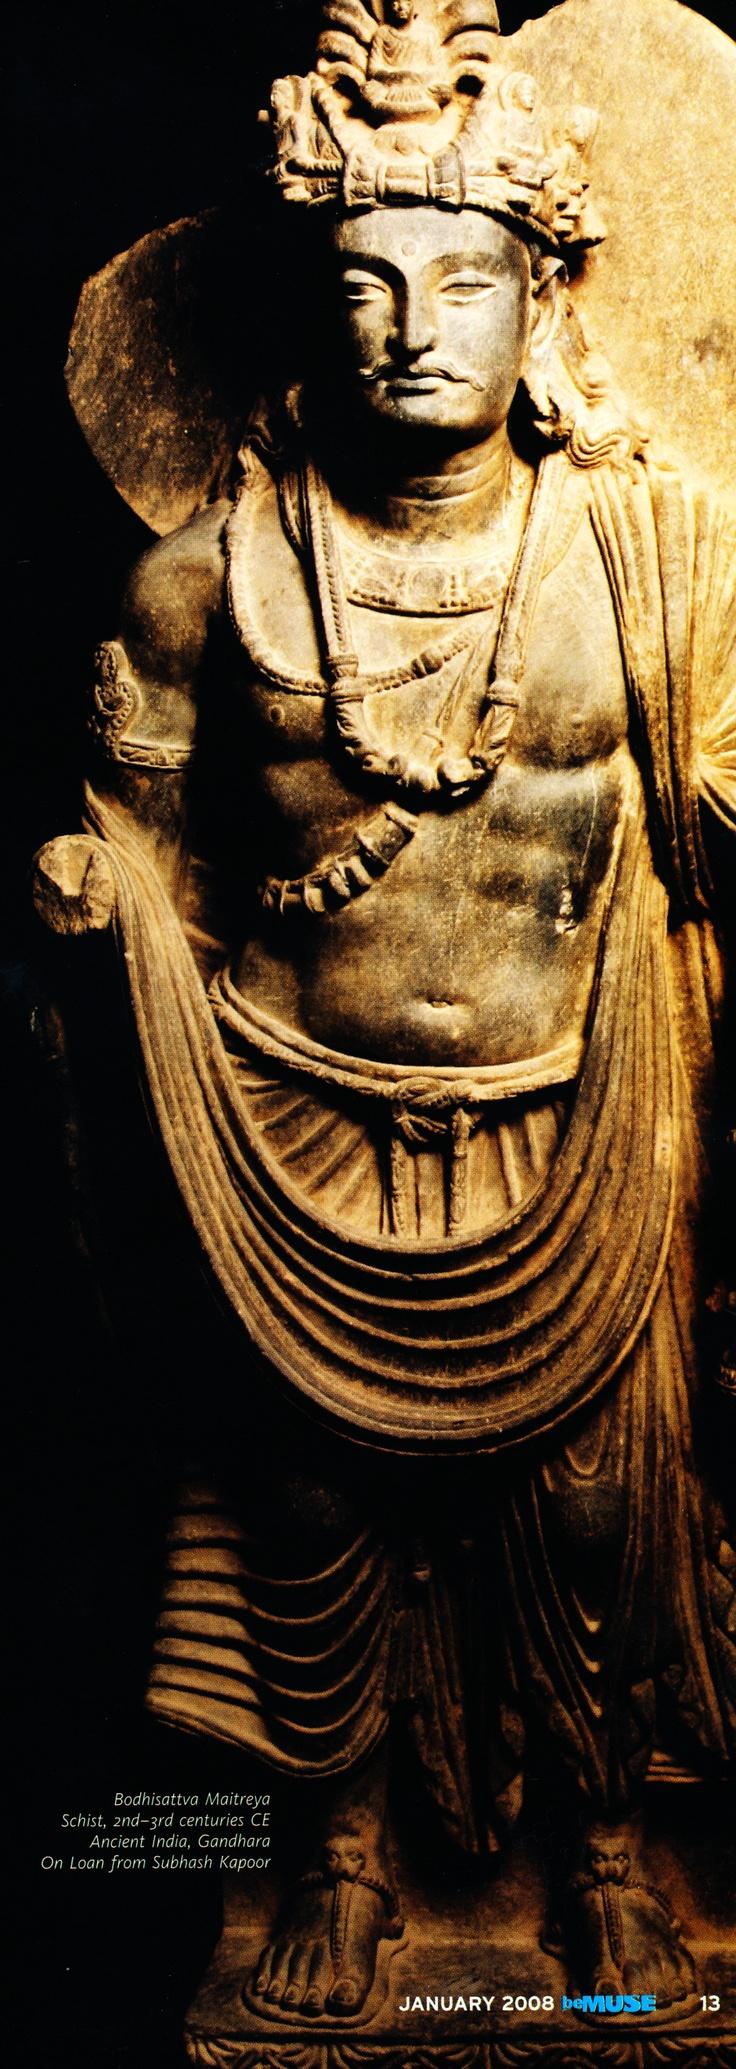 Maitreya Buddha, 2nd Century CE, Ancient India, Gandhara Civilization.   Credit: On The Nalanda Trail exhibition, Singapore. - Greco-Buddhist art